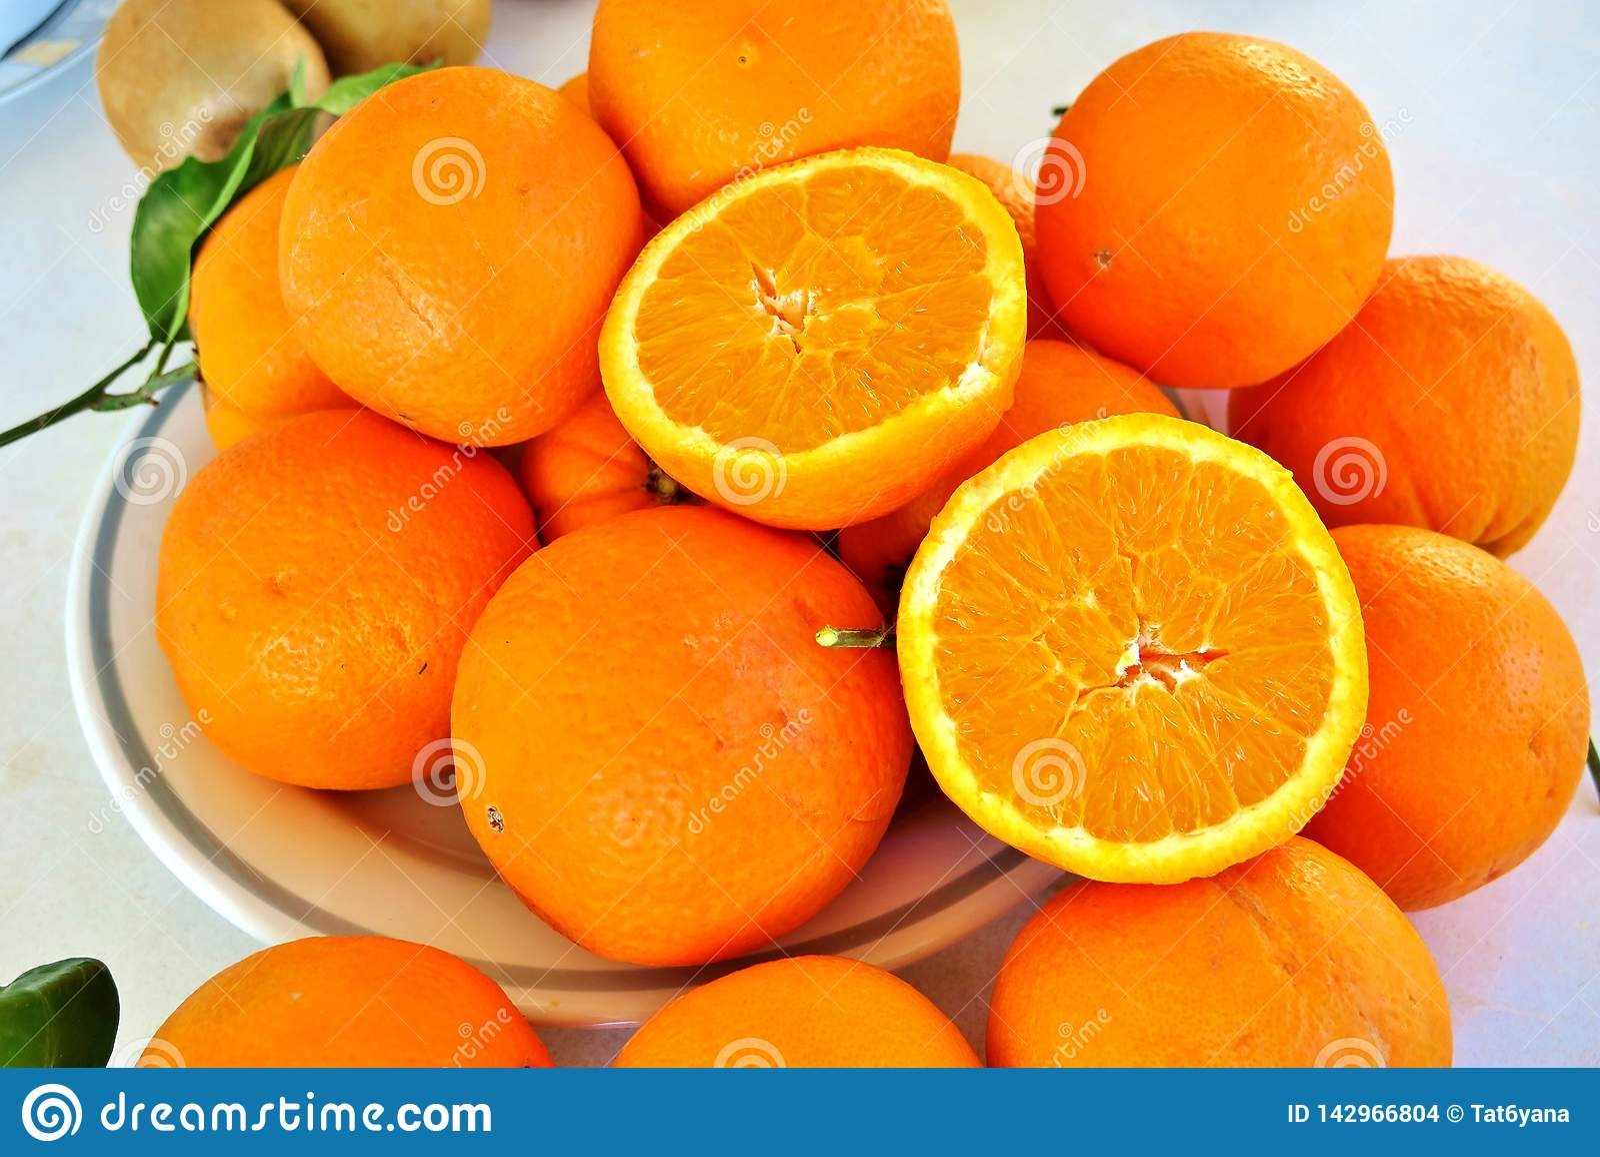 Oranje grote rijpe sinaasappelen, gezond vitaminesap